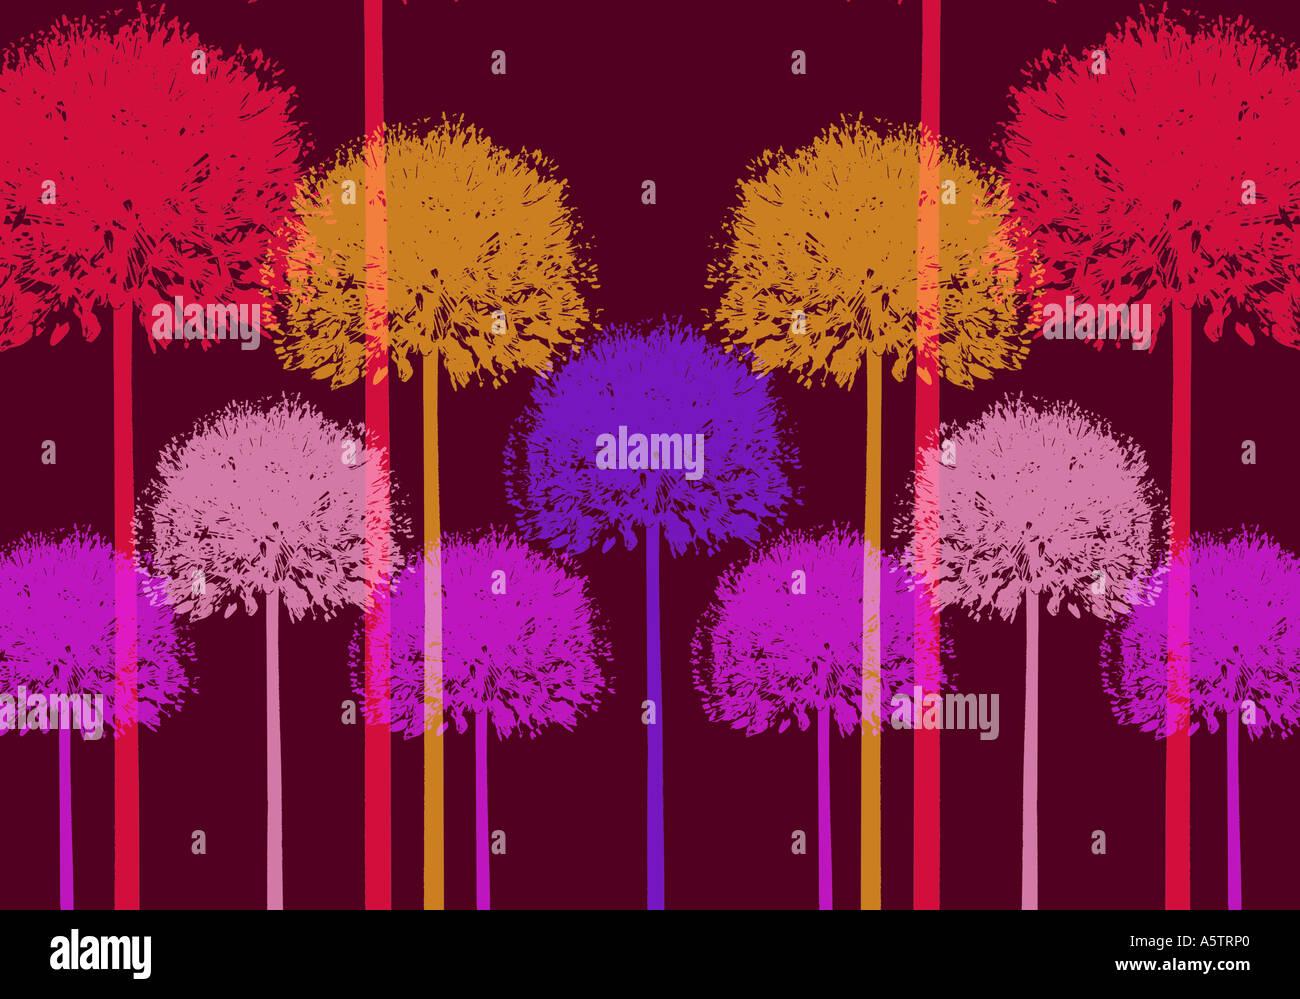 Grafisches Muster - Allium Abbildung Stockbild